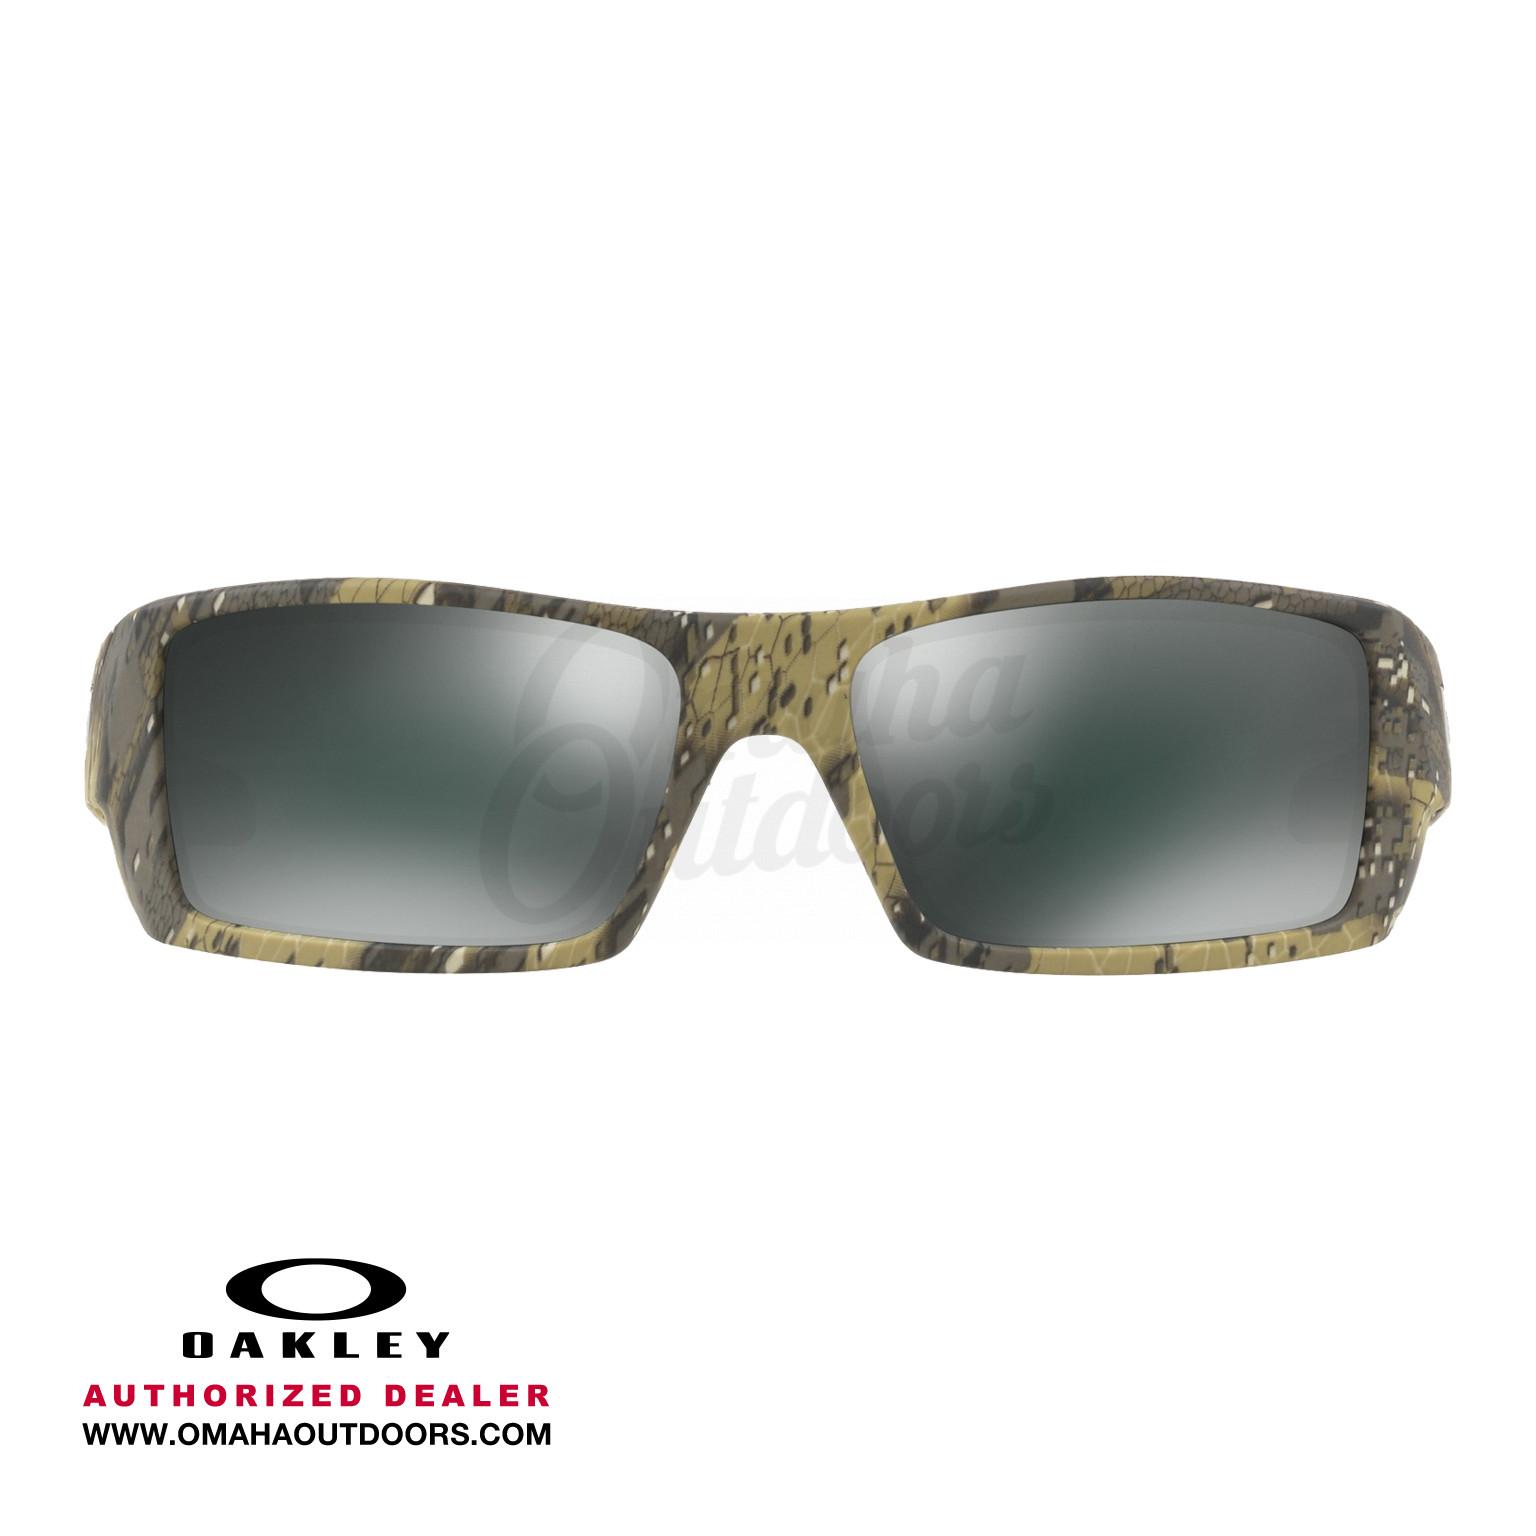 6b143bf678b Oakley Gascan Standard Issue Desolve Camo Collection Sunglasses Black  Iridium Lens · OO9014-12 · 888392235633